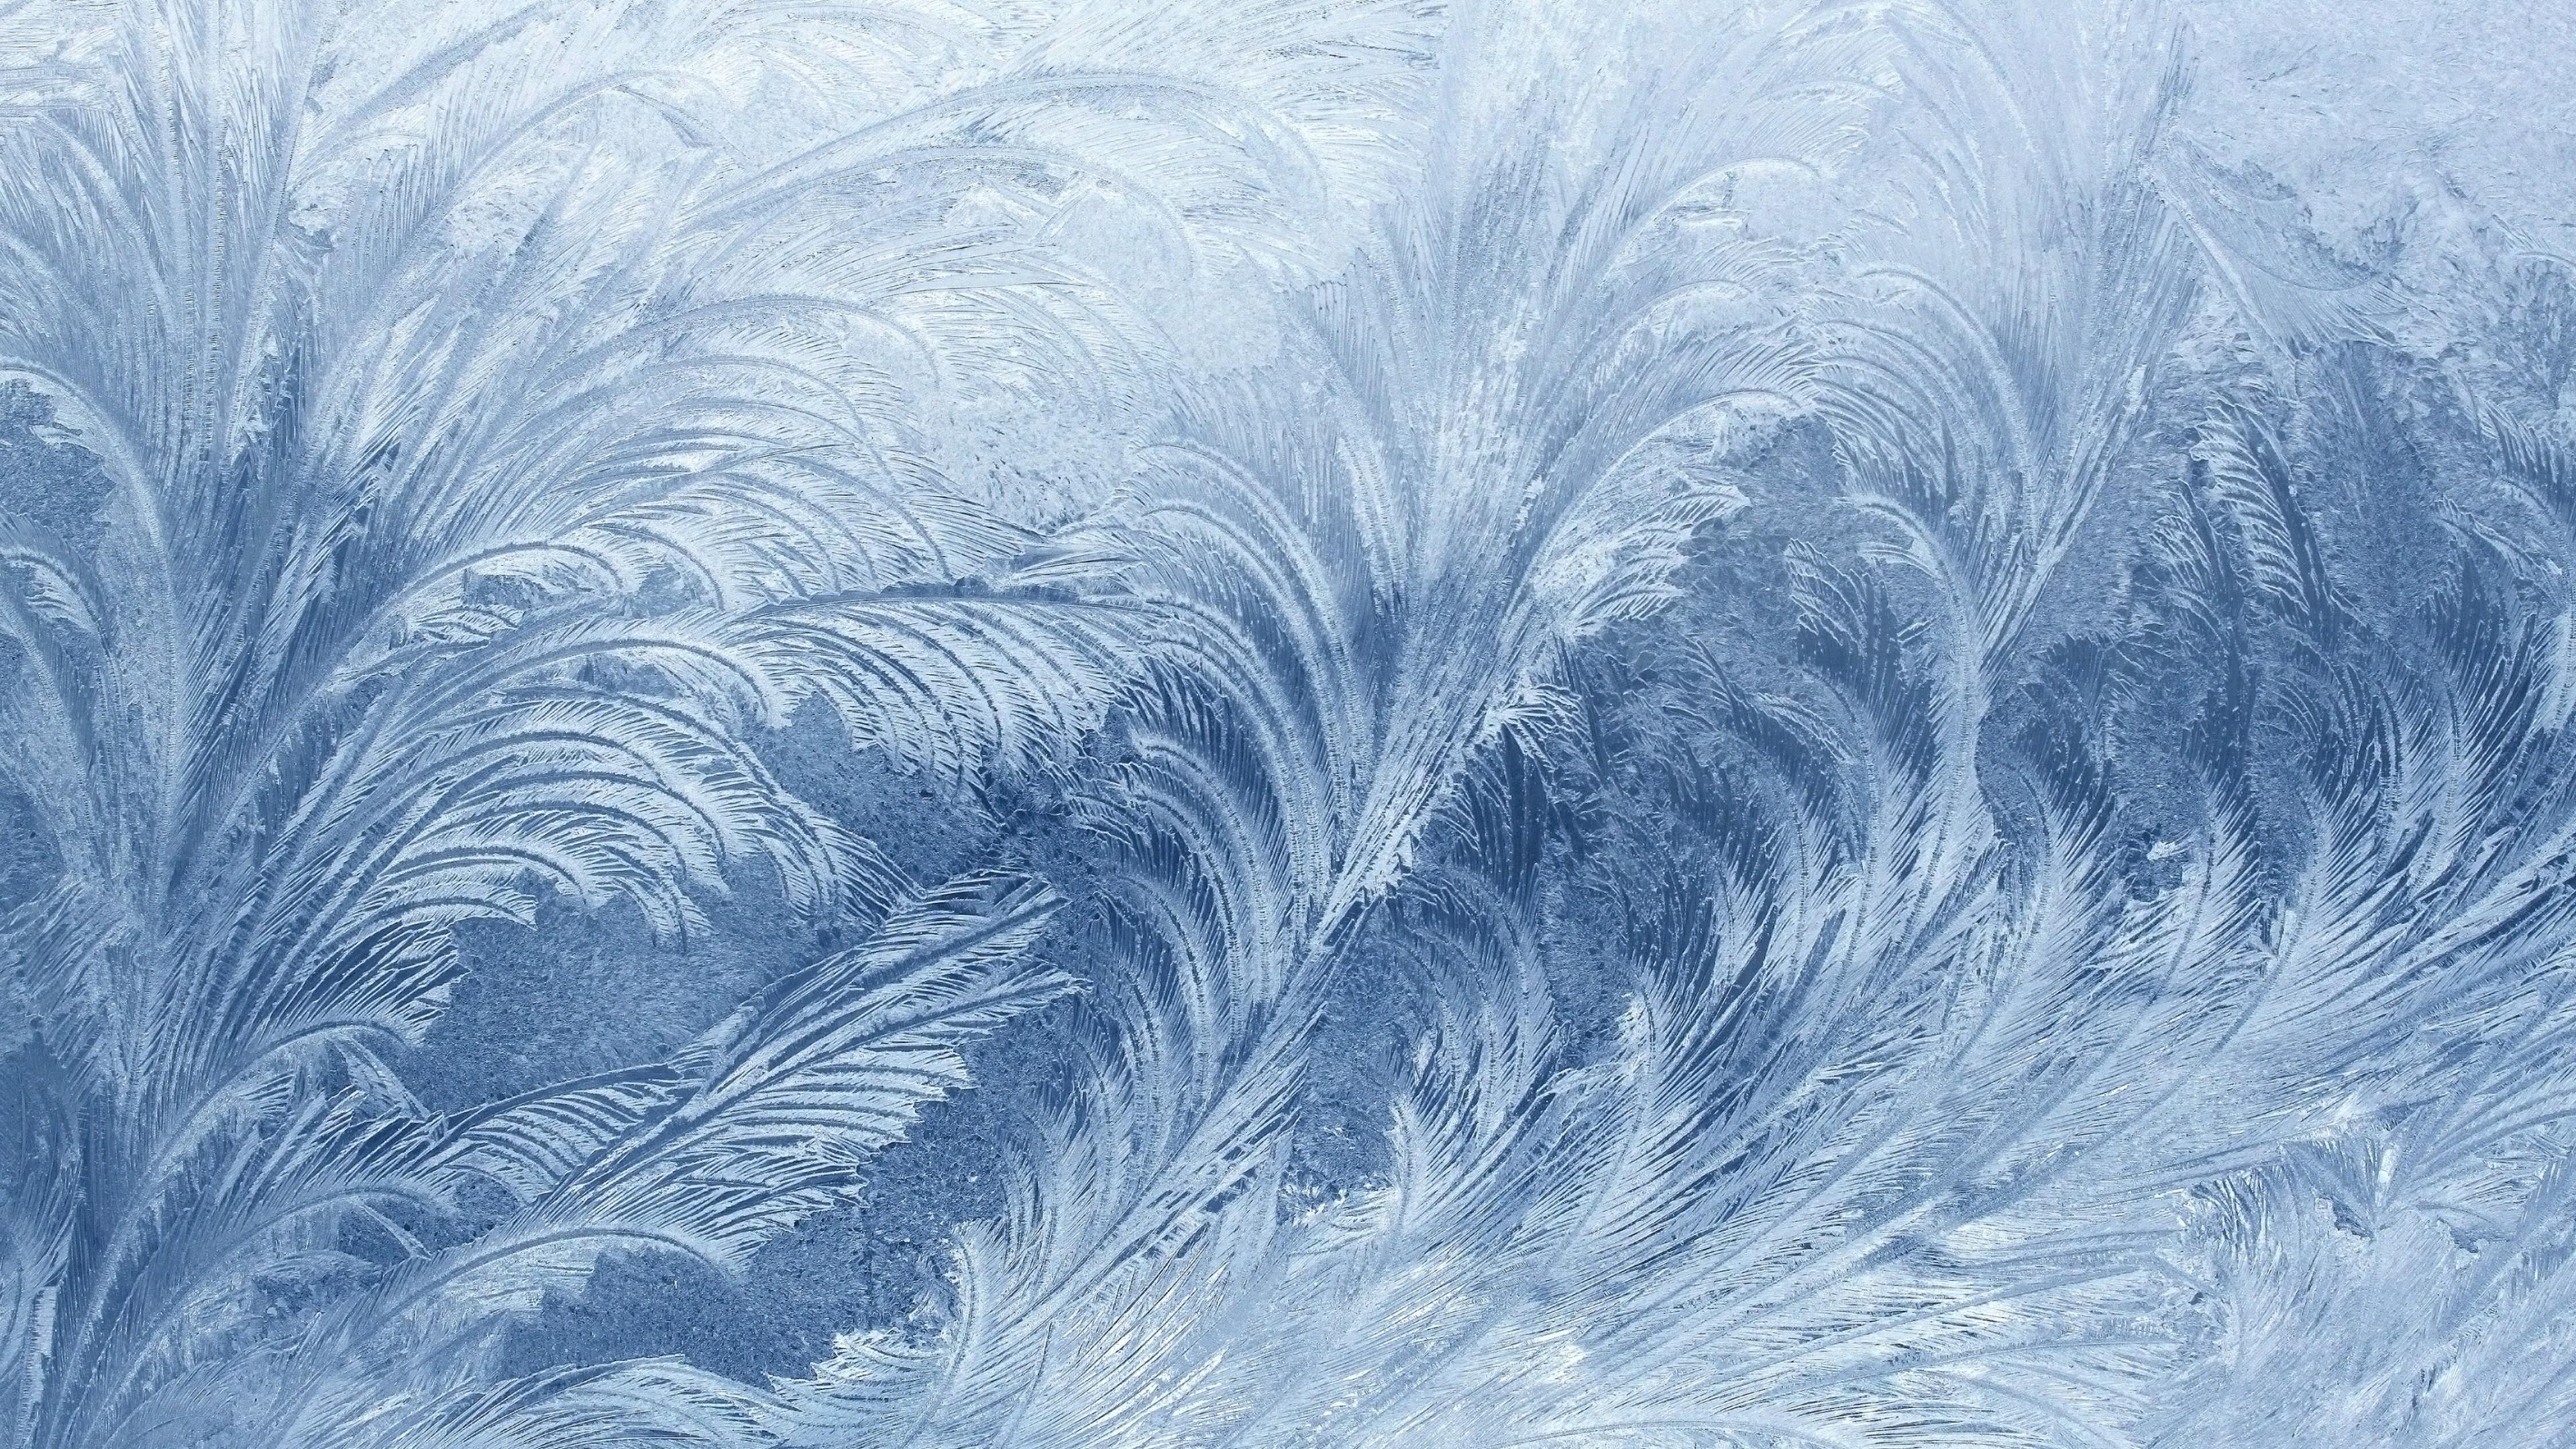 Frozen Quotes Wallpaper Wallpaper Frozen 4k 5k Wallpaper Pattern Glass Snow